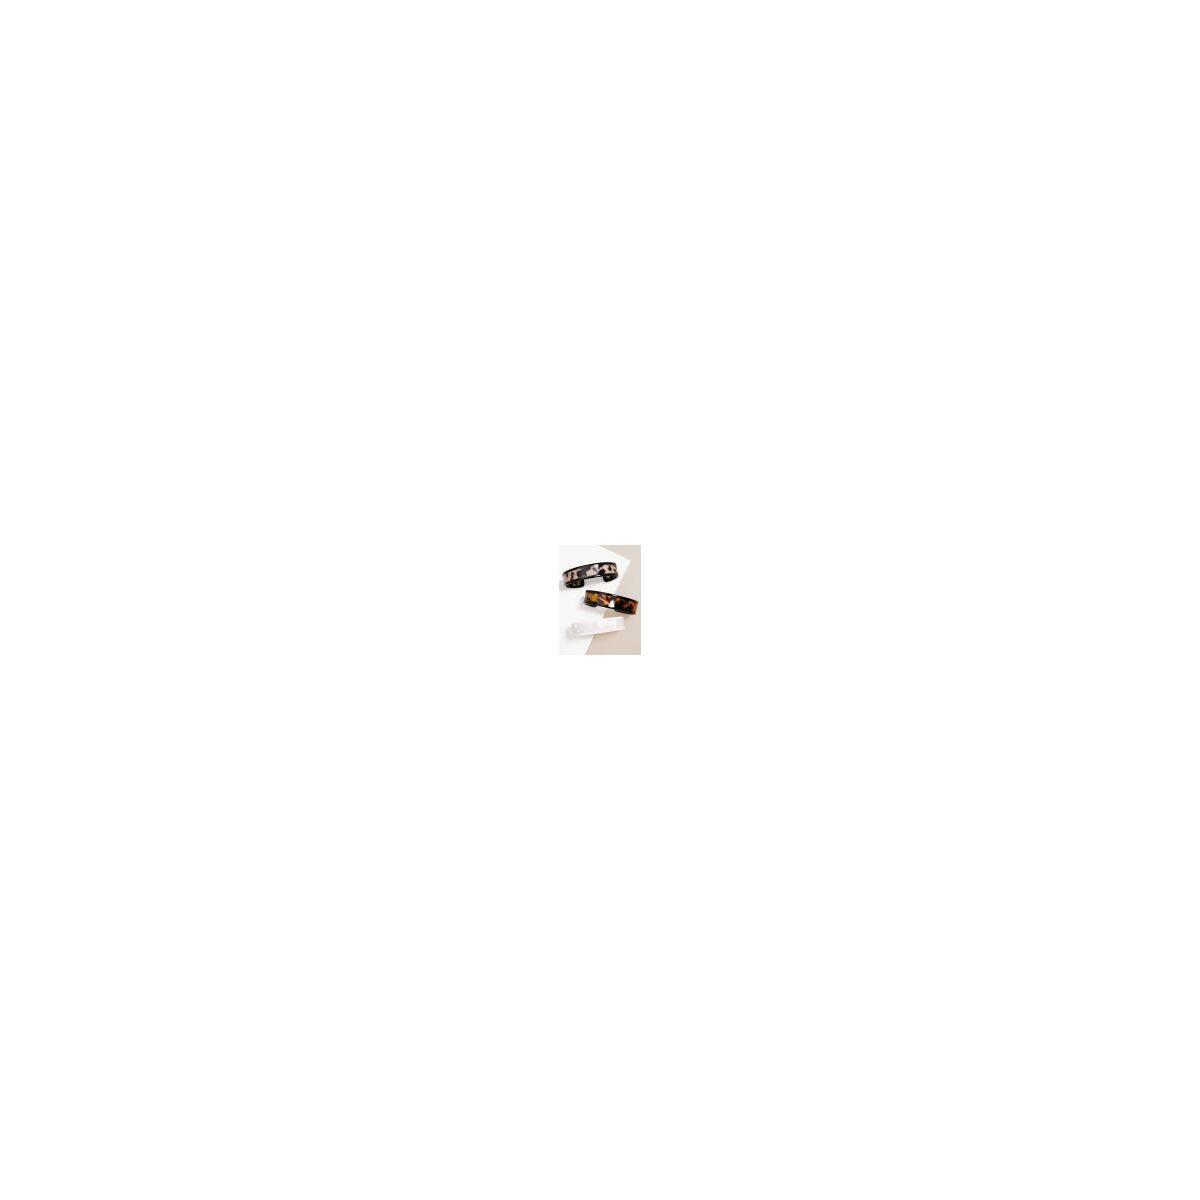 Skinny Lined Tortoise Cuff Bracelet | Stylish Costume Jewelry, Black/Brown